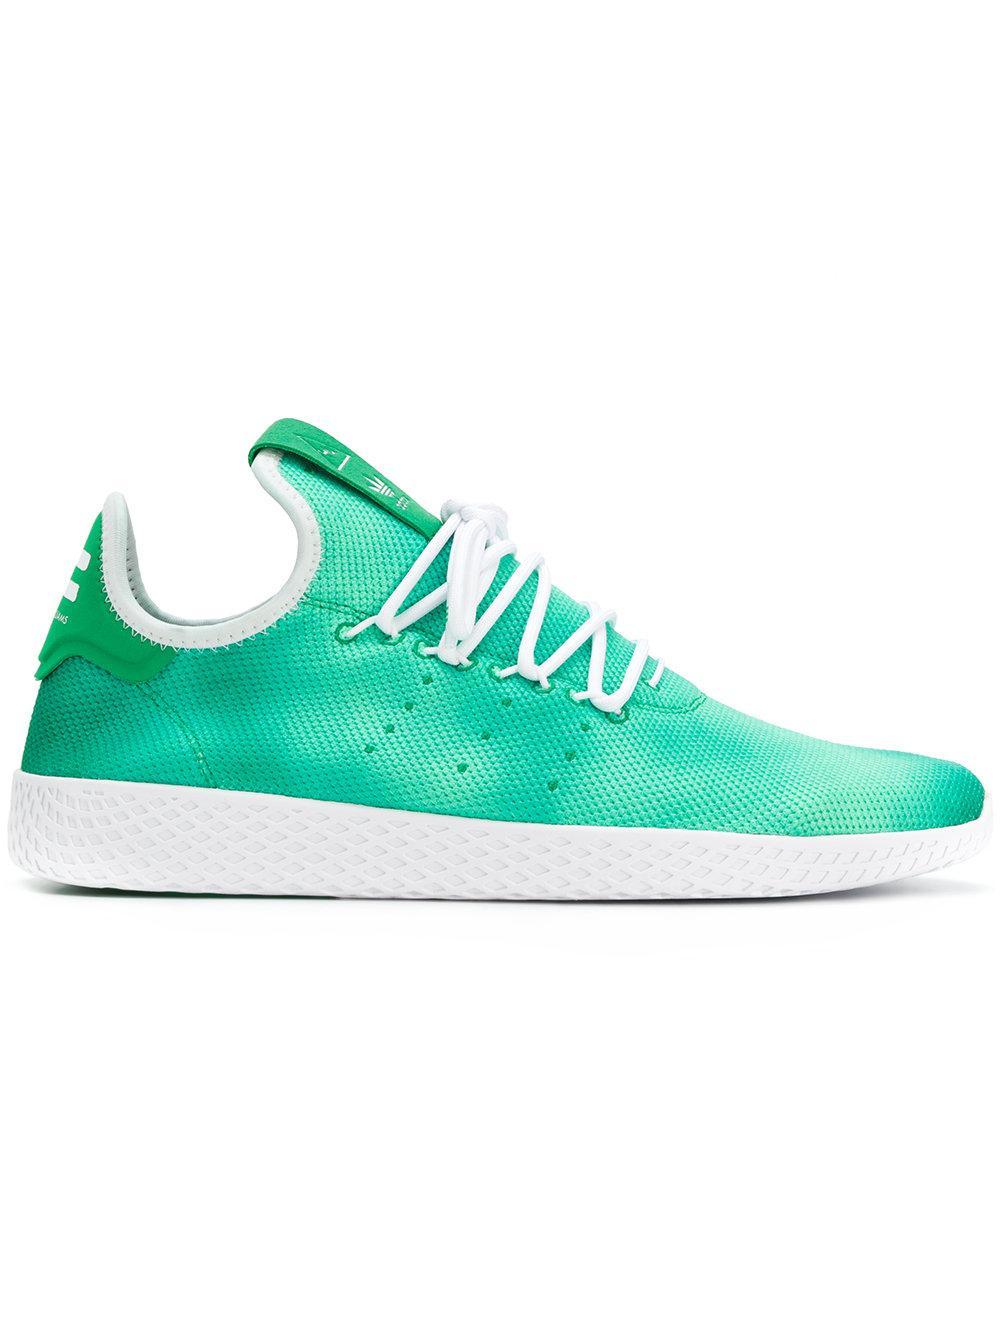 de6f068519f83 Adidas Originals X Pharrell Williams Adidas Adidas By Pharrell Williams  Sneakers - Green